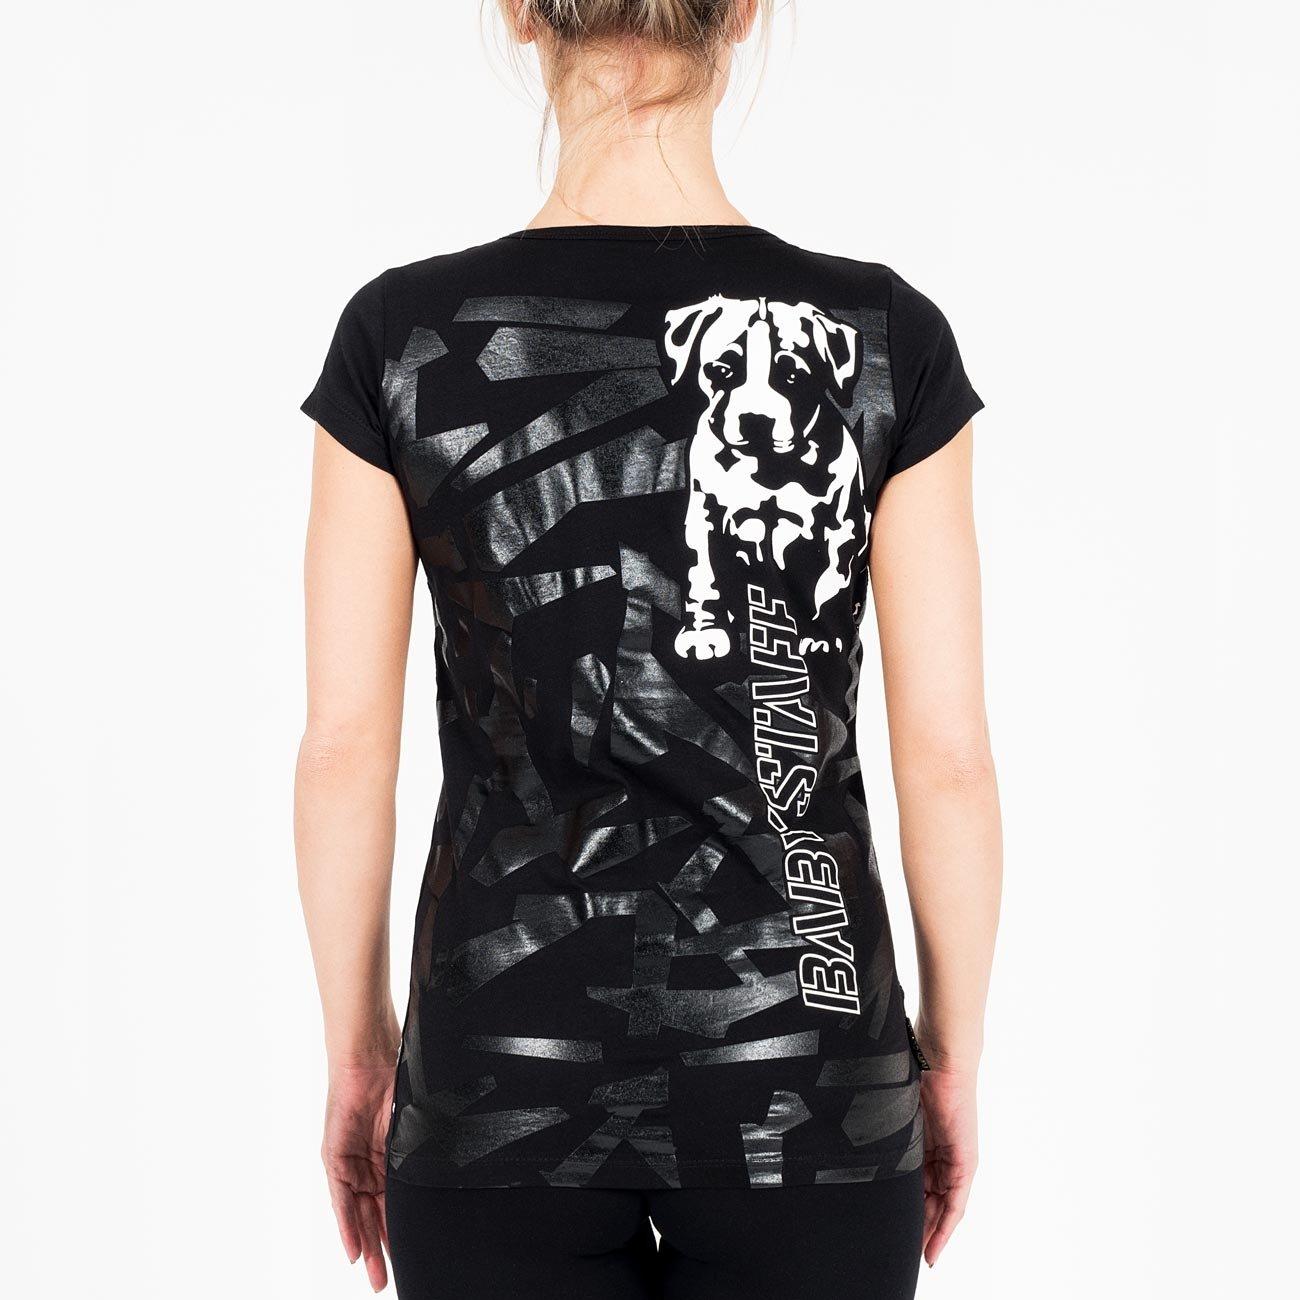 Babystaff Floya T-Shirt Frauen Oberteil Shirt Größe XS S M L XL